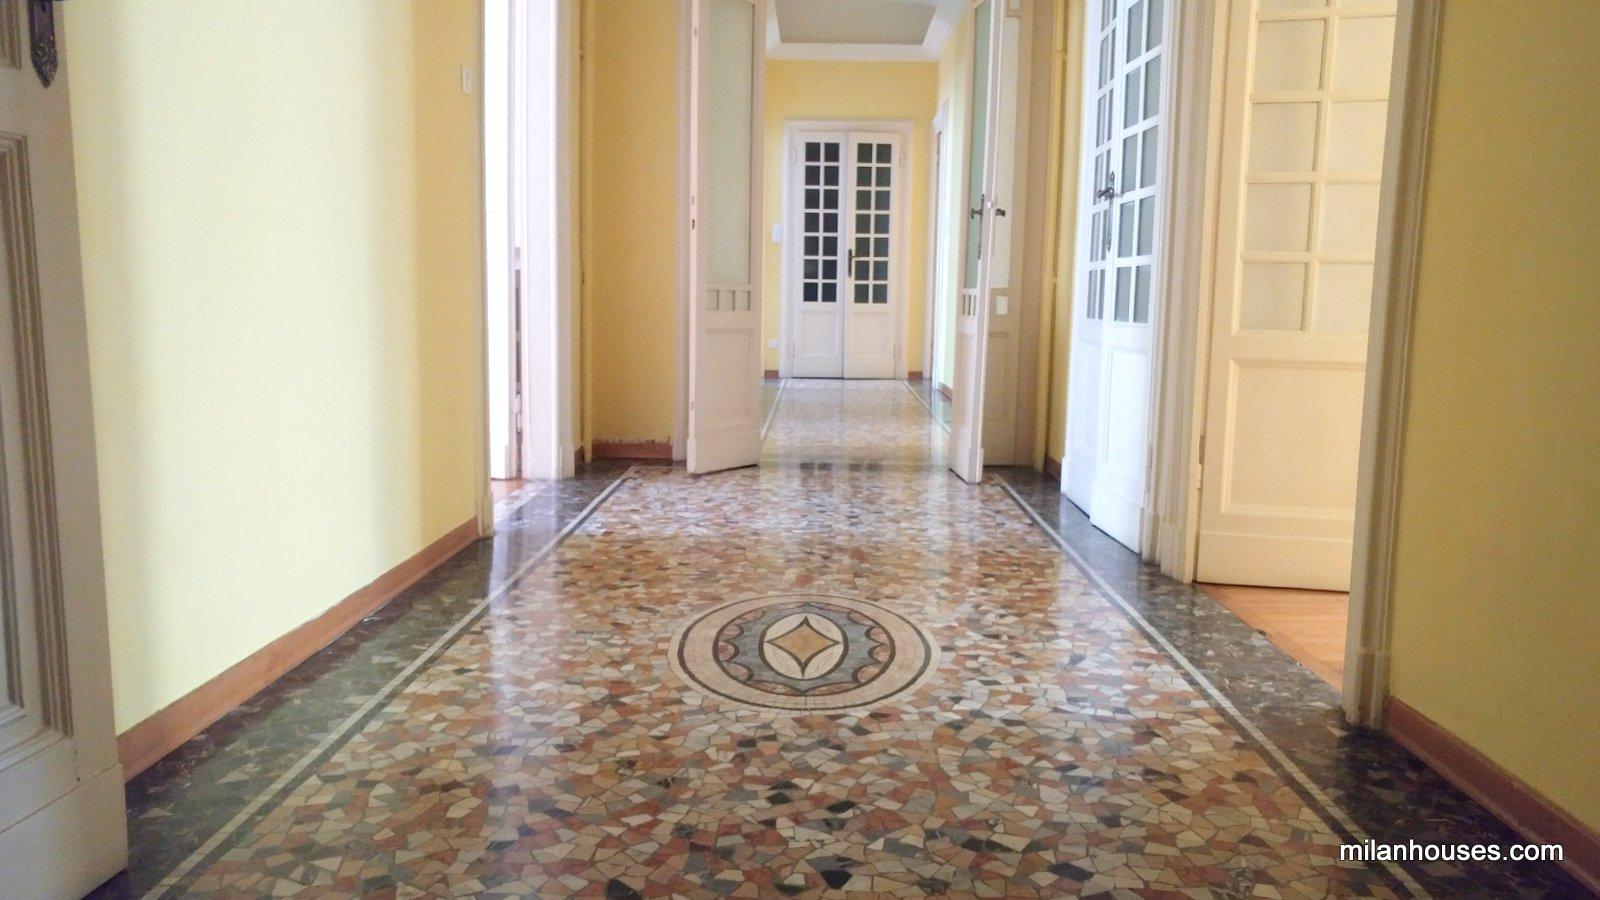 Milano | Appartamento in Affitto in Via Leopoldo Cicognara | lacasadimilano.it